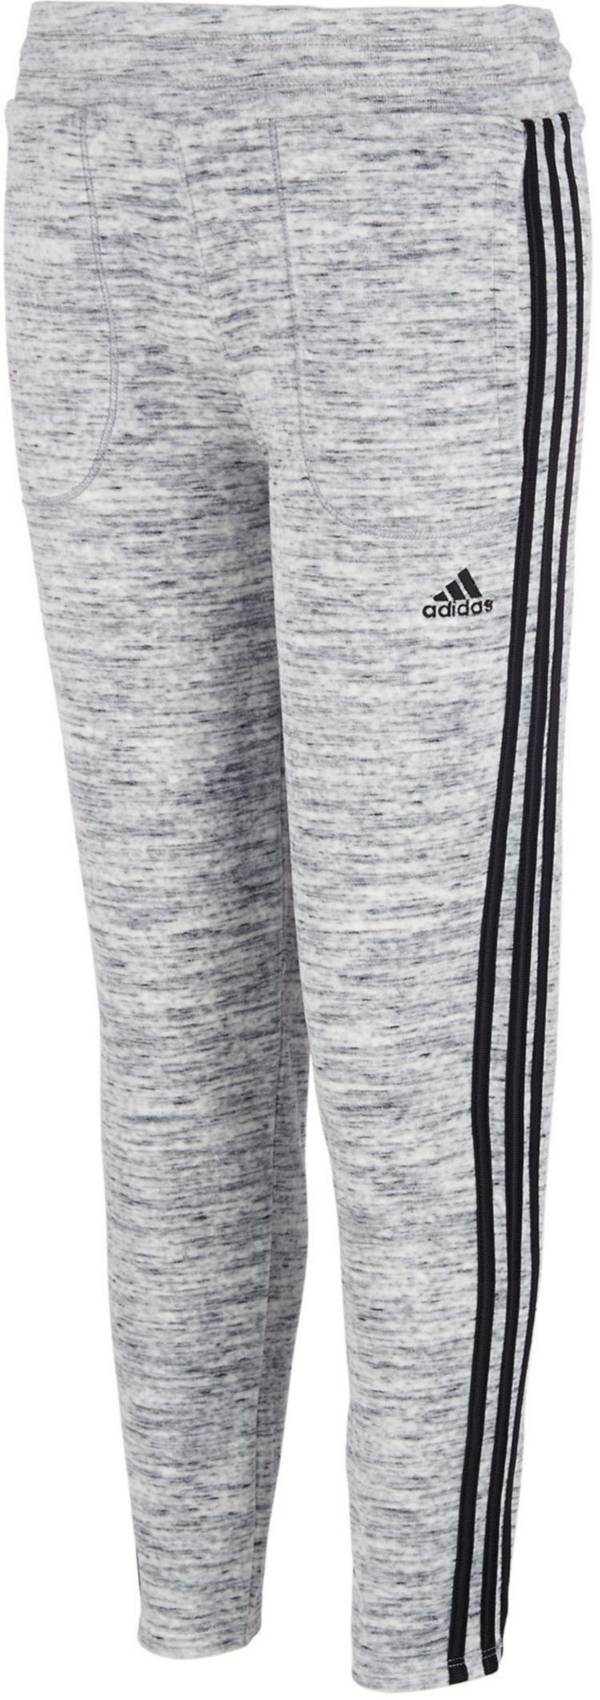 adidas Girls' Velour Heathered Tapered Pants product image